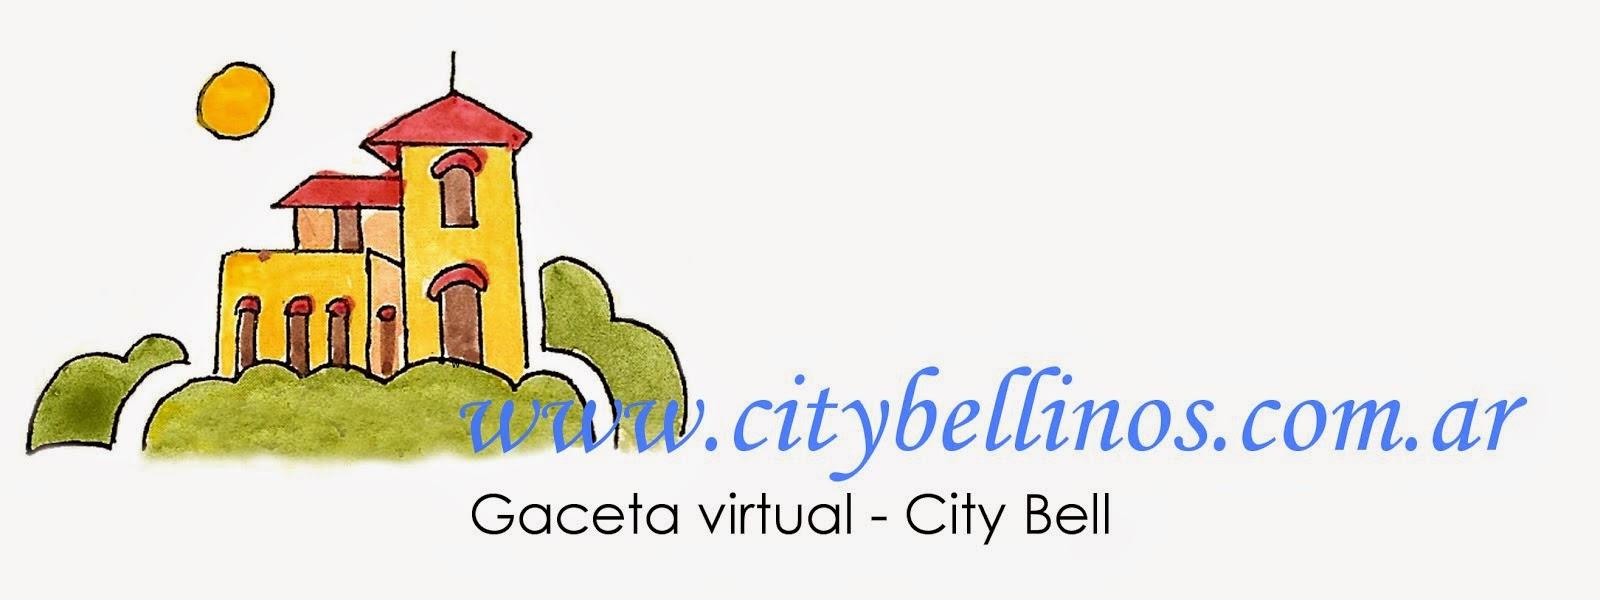 Citybellinos